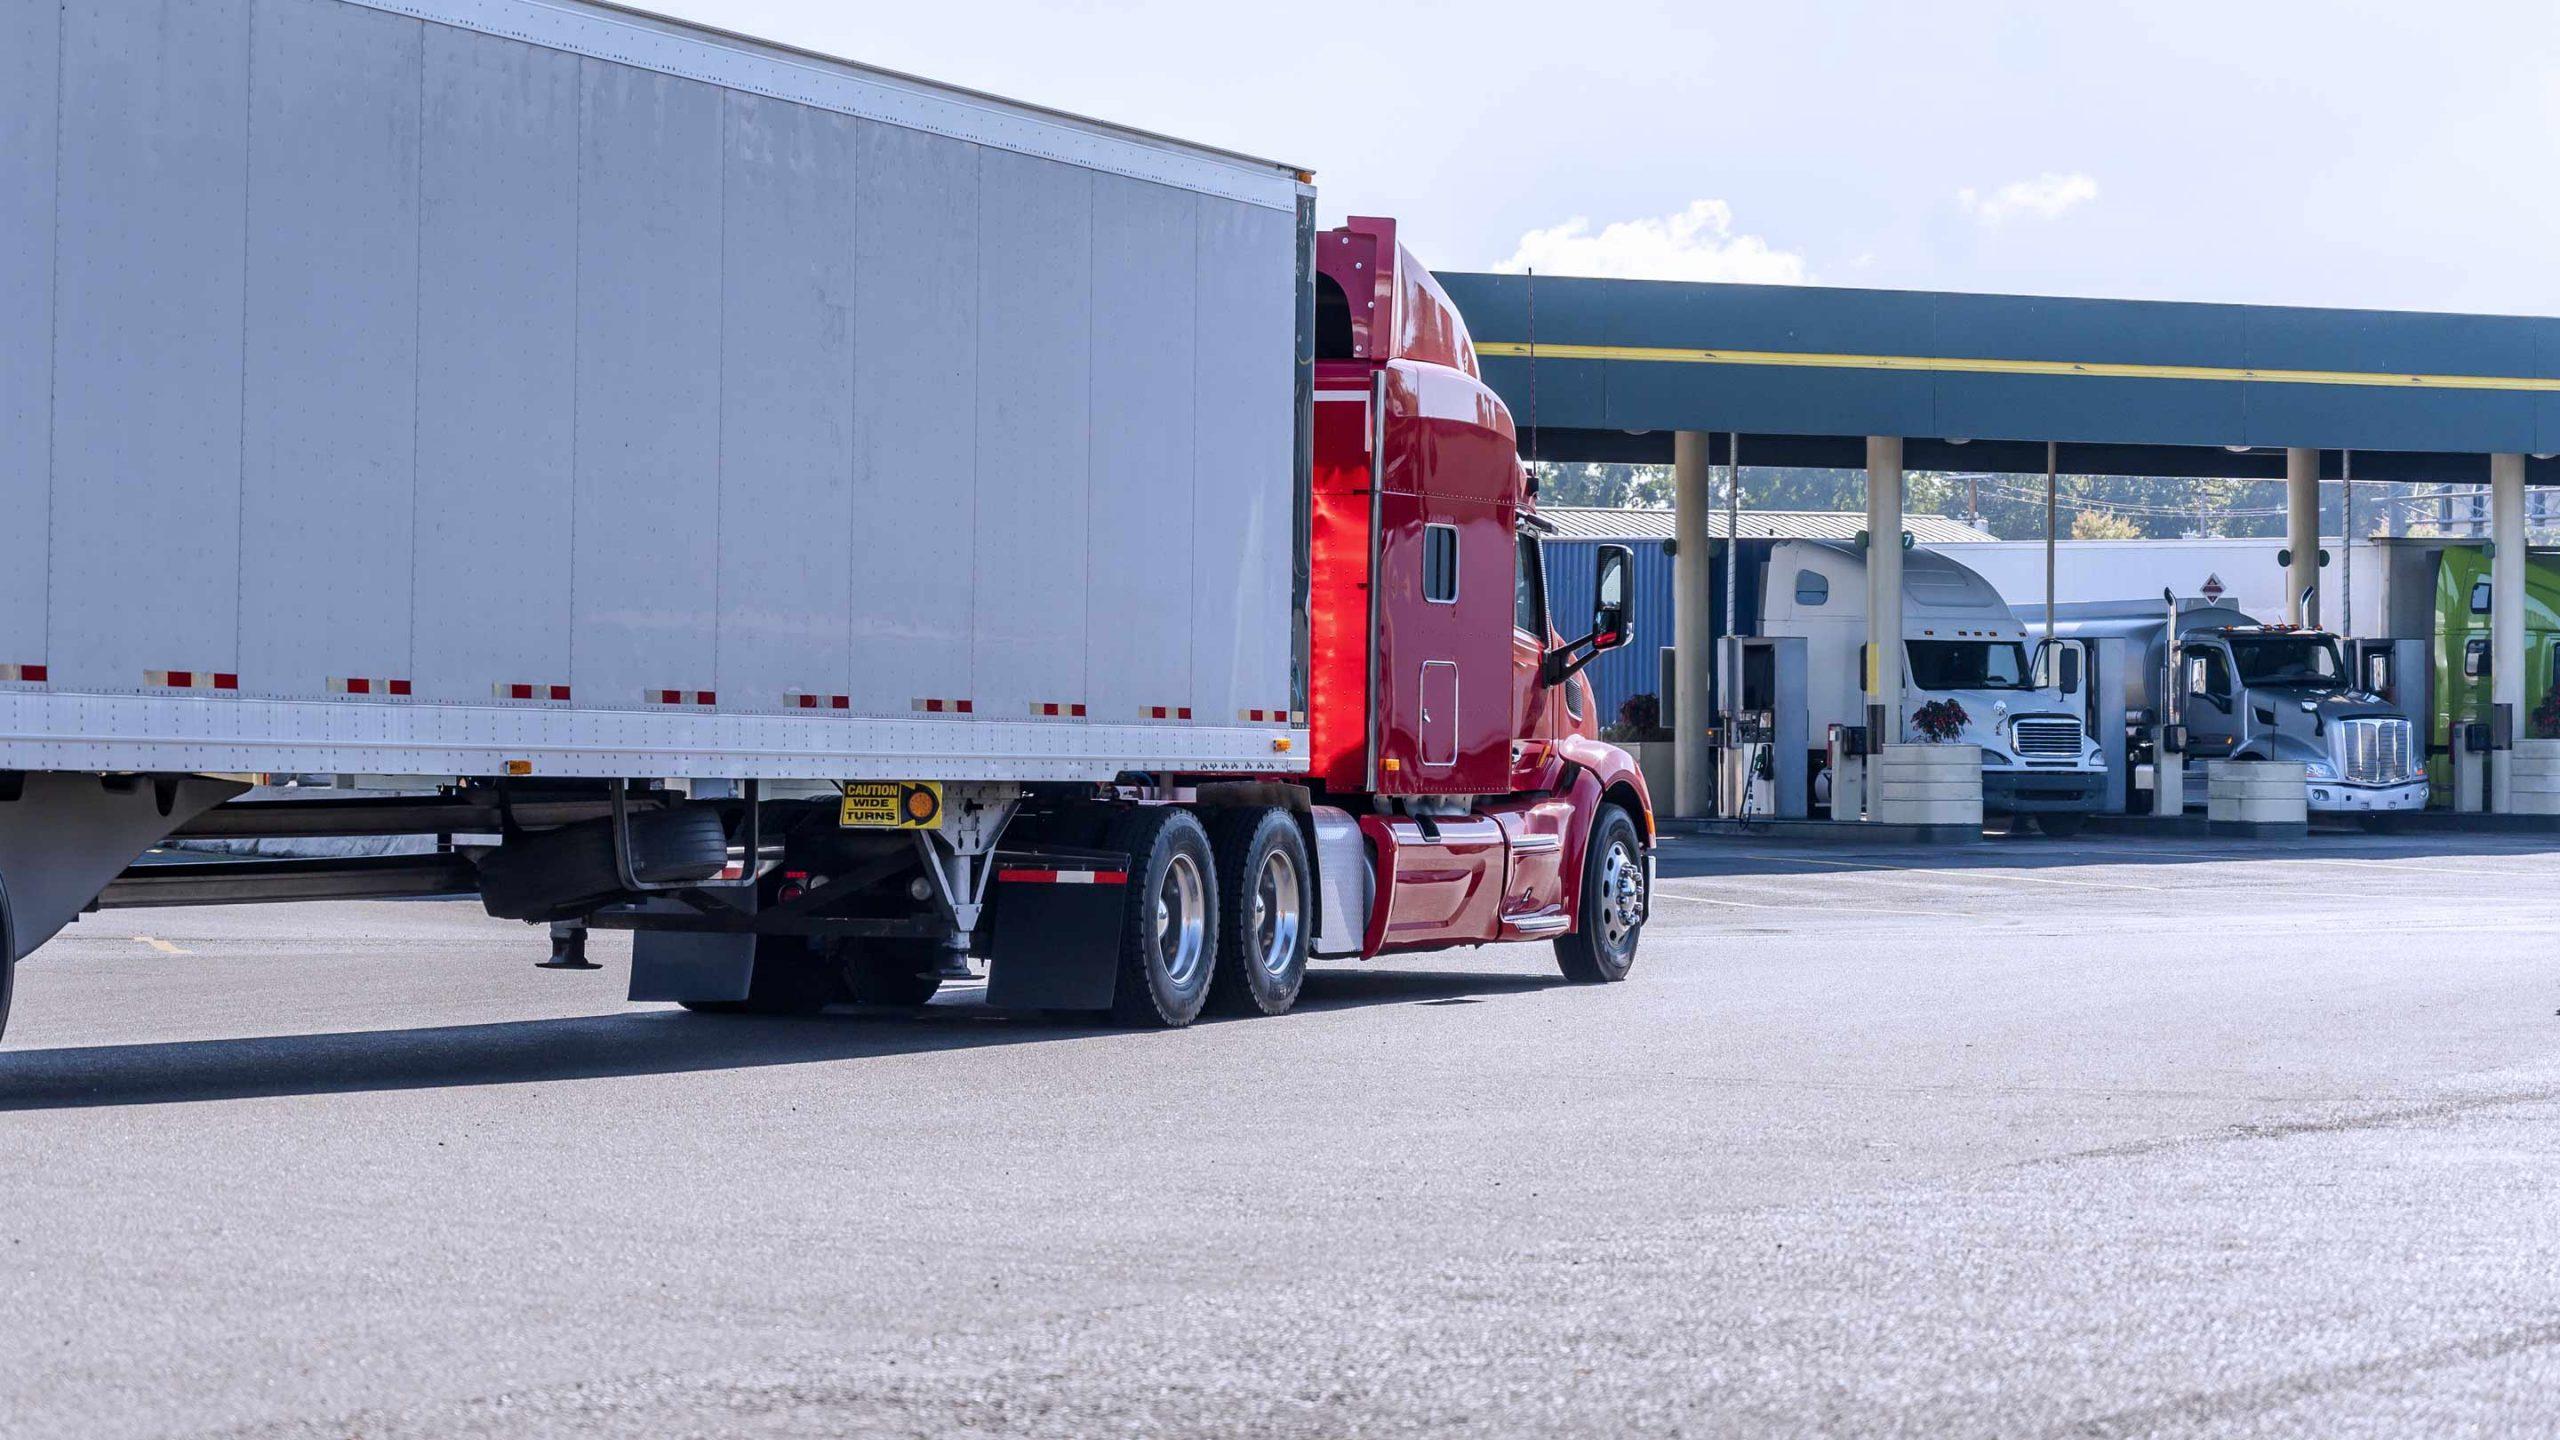 Transport Trucks Fuelling at Gas Station